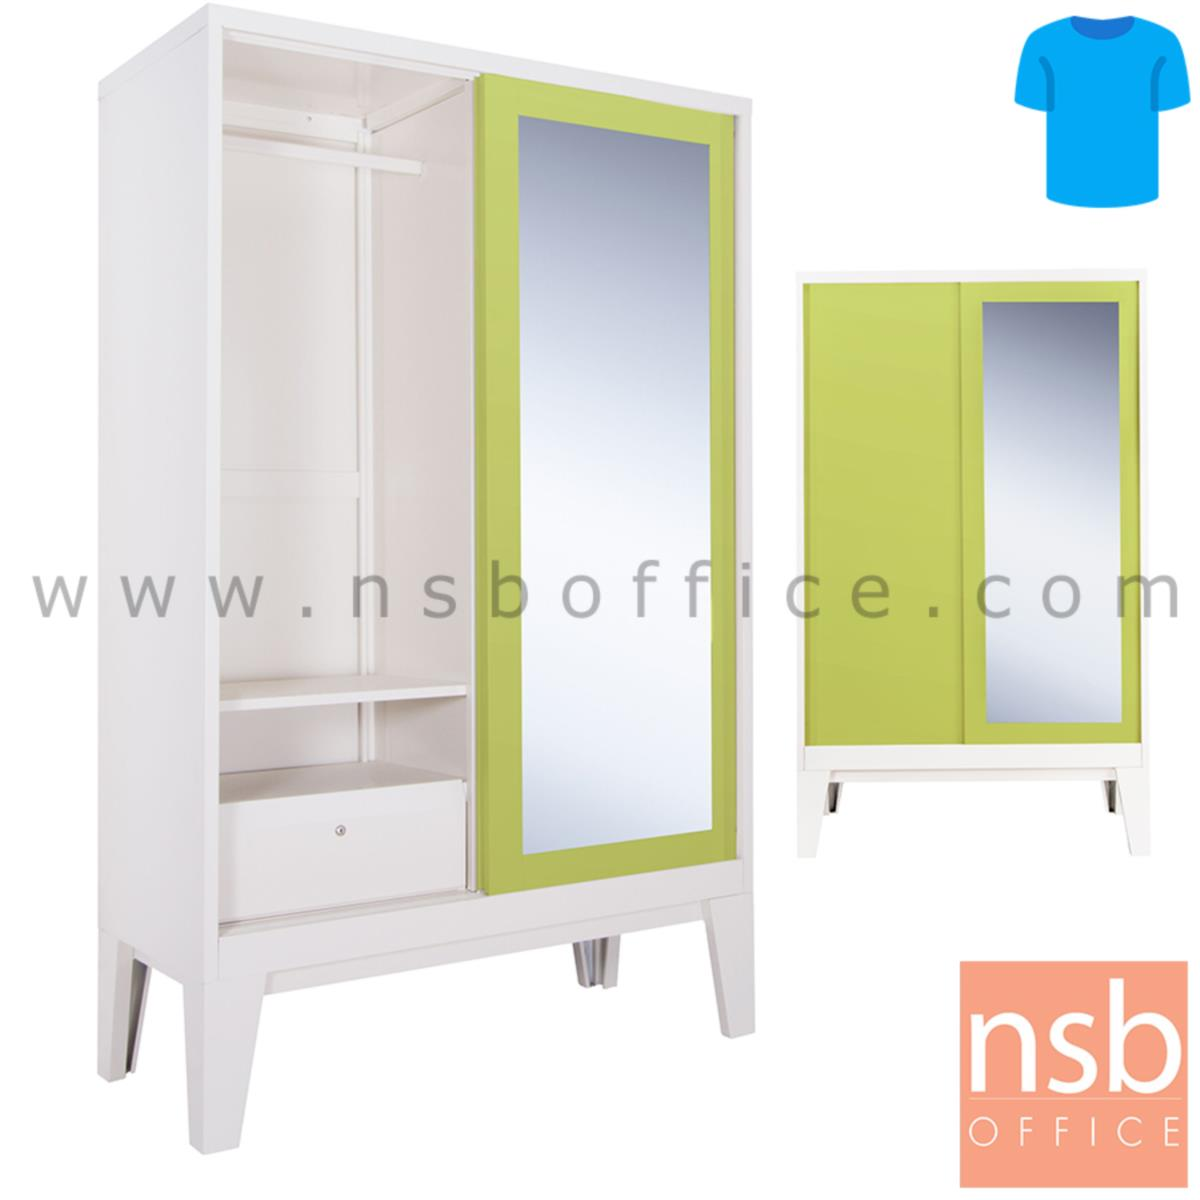 E23A024:ตู้เสื้อผ้าบานเลื่อนกระจกเงา สูง 200H cm. รุ่น BW-04  แบบมีลิ้นชักและไม่มีลิ้นชัก พร้อมขารองตู้